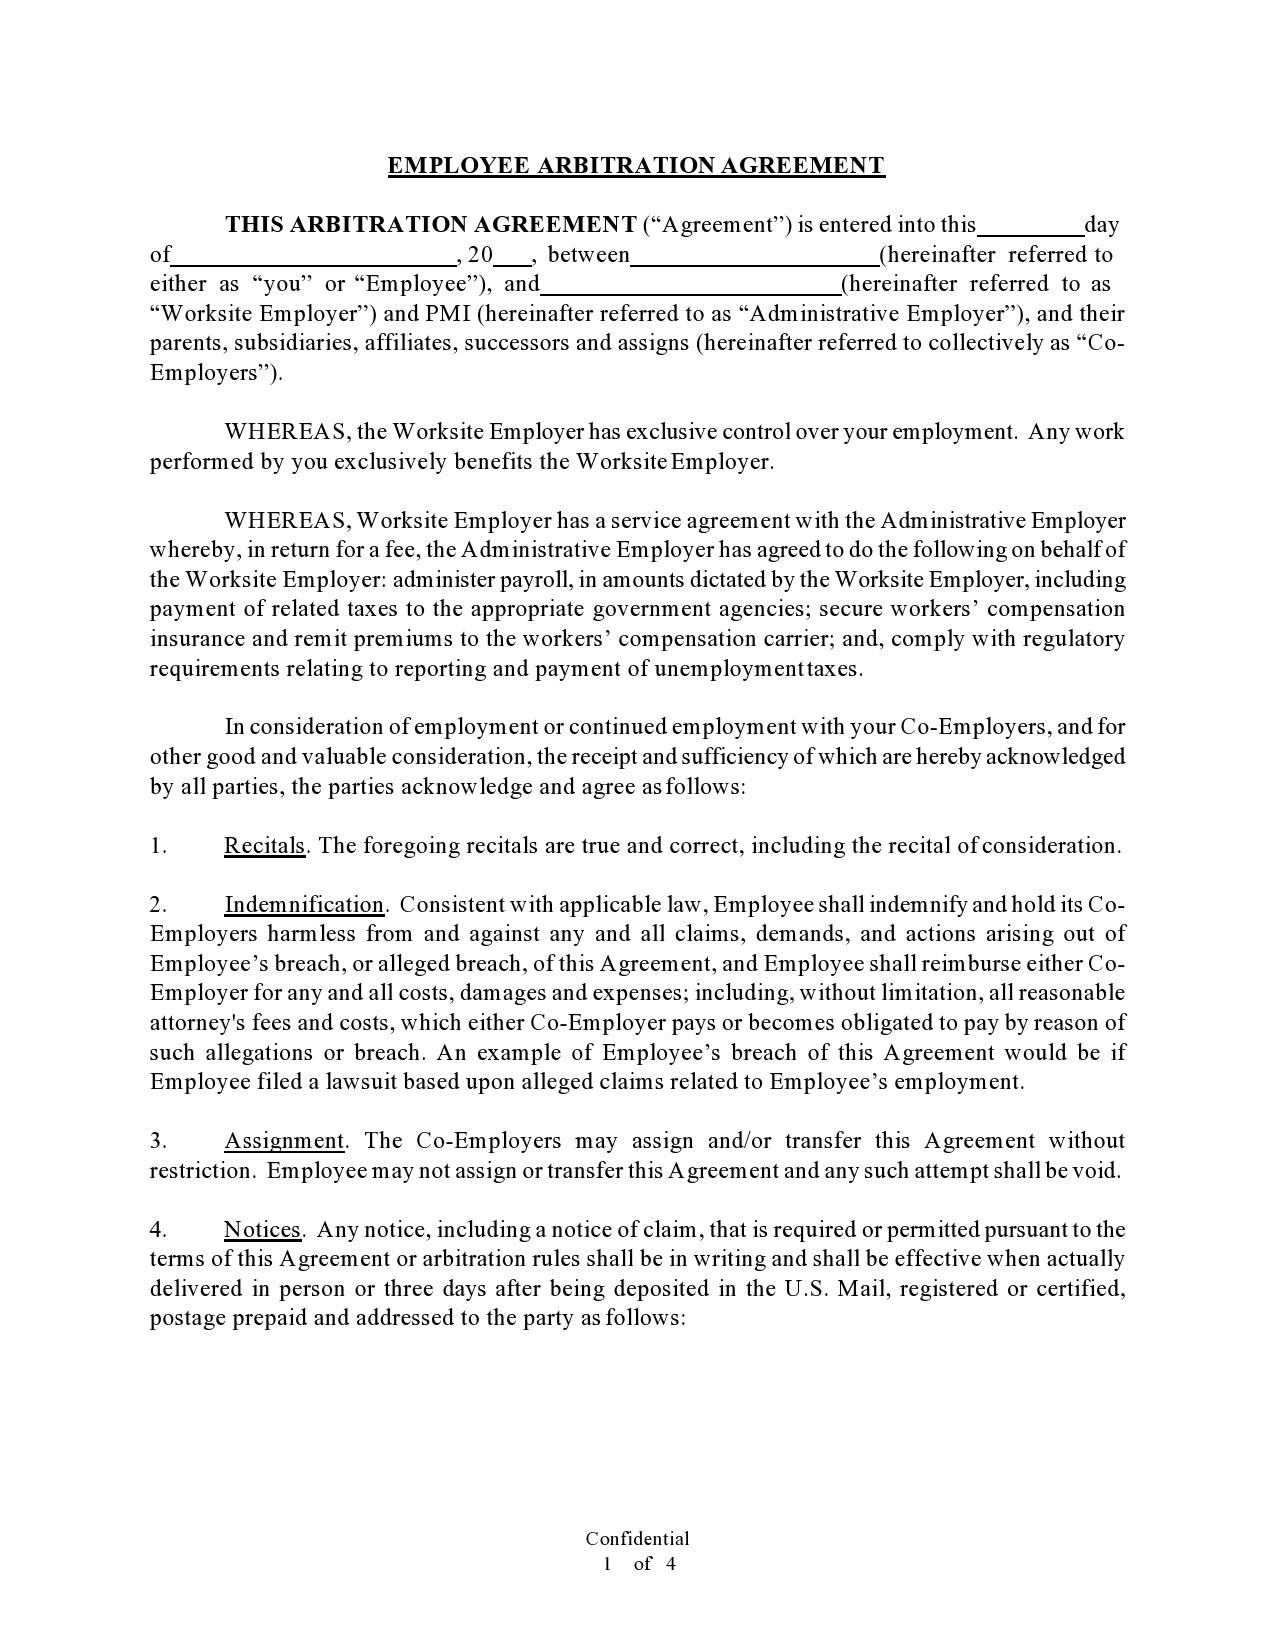 Free arbitration agreement 11